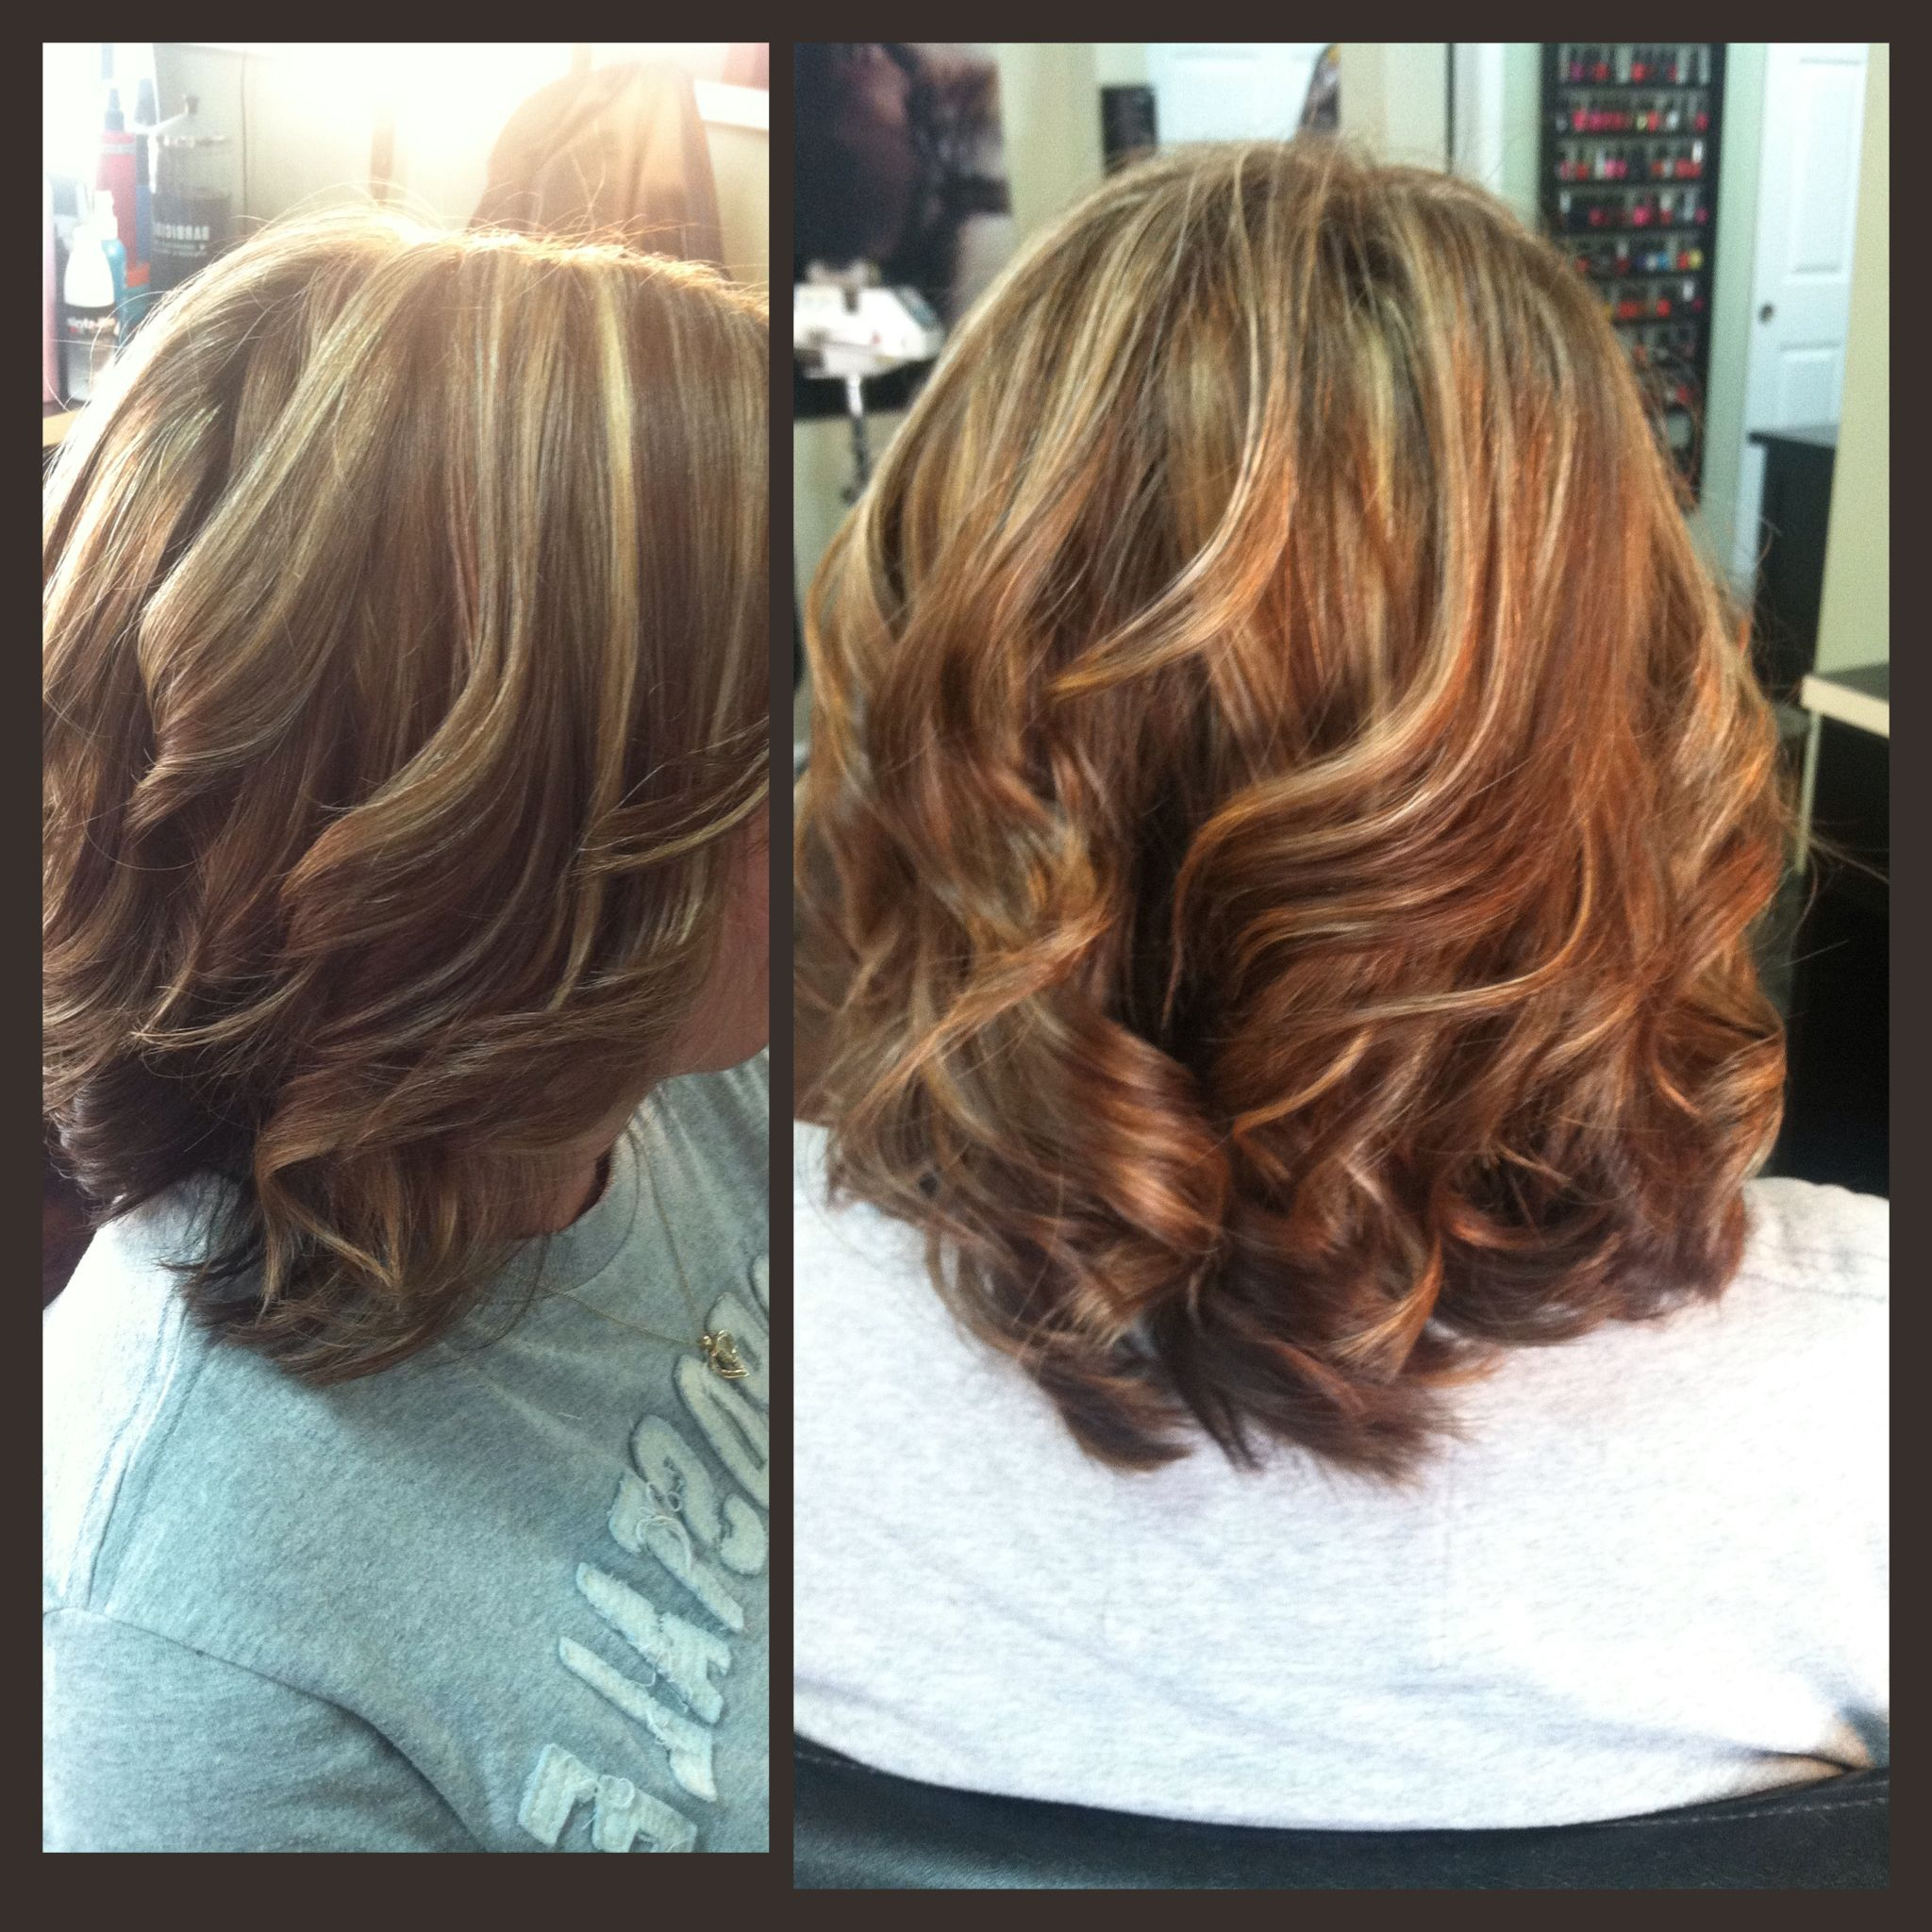 Medium length brown hair with blonde highlights makeup and hair